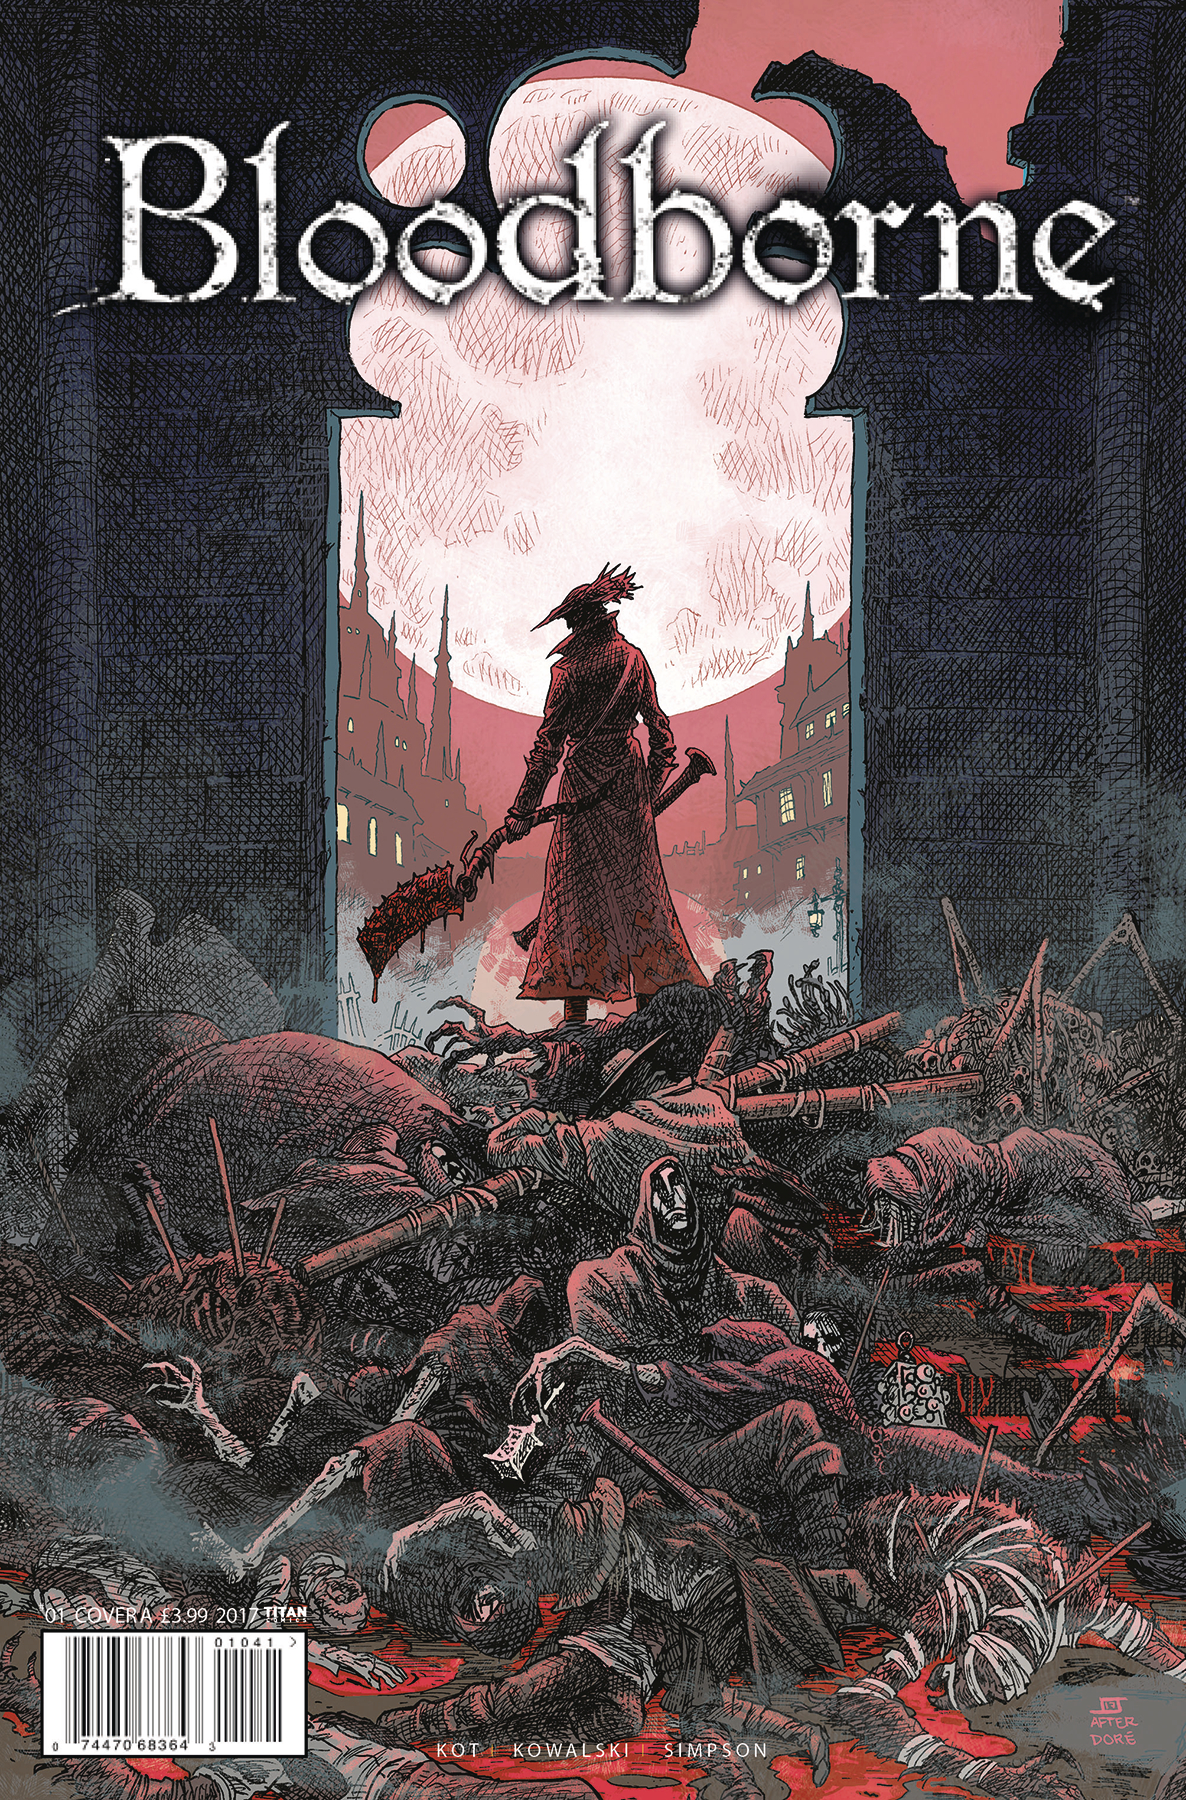 http://www.pastemagazine.com/articles/BloodborneComic.jpeg